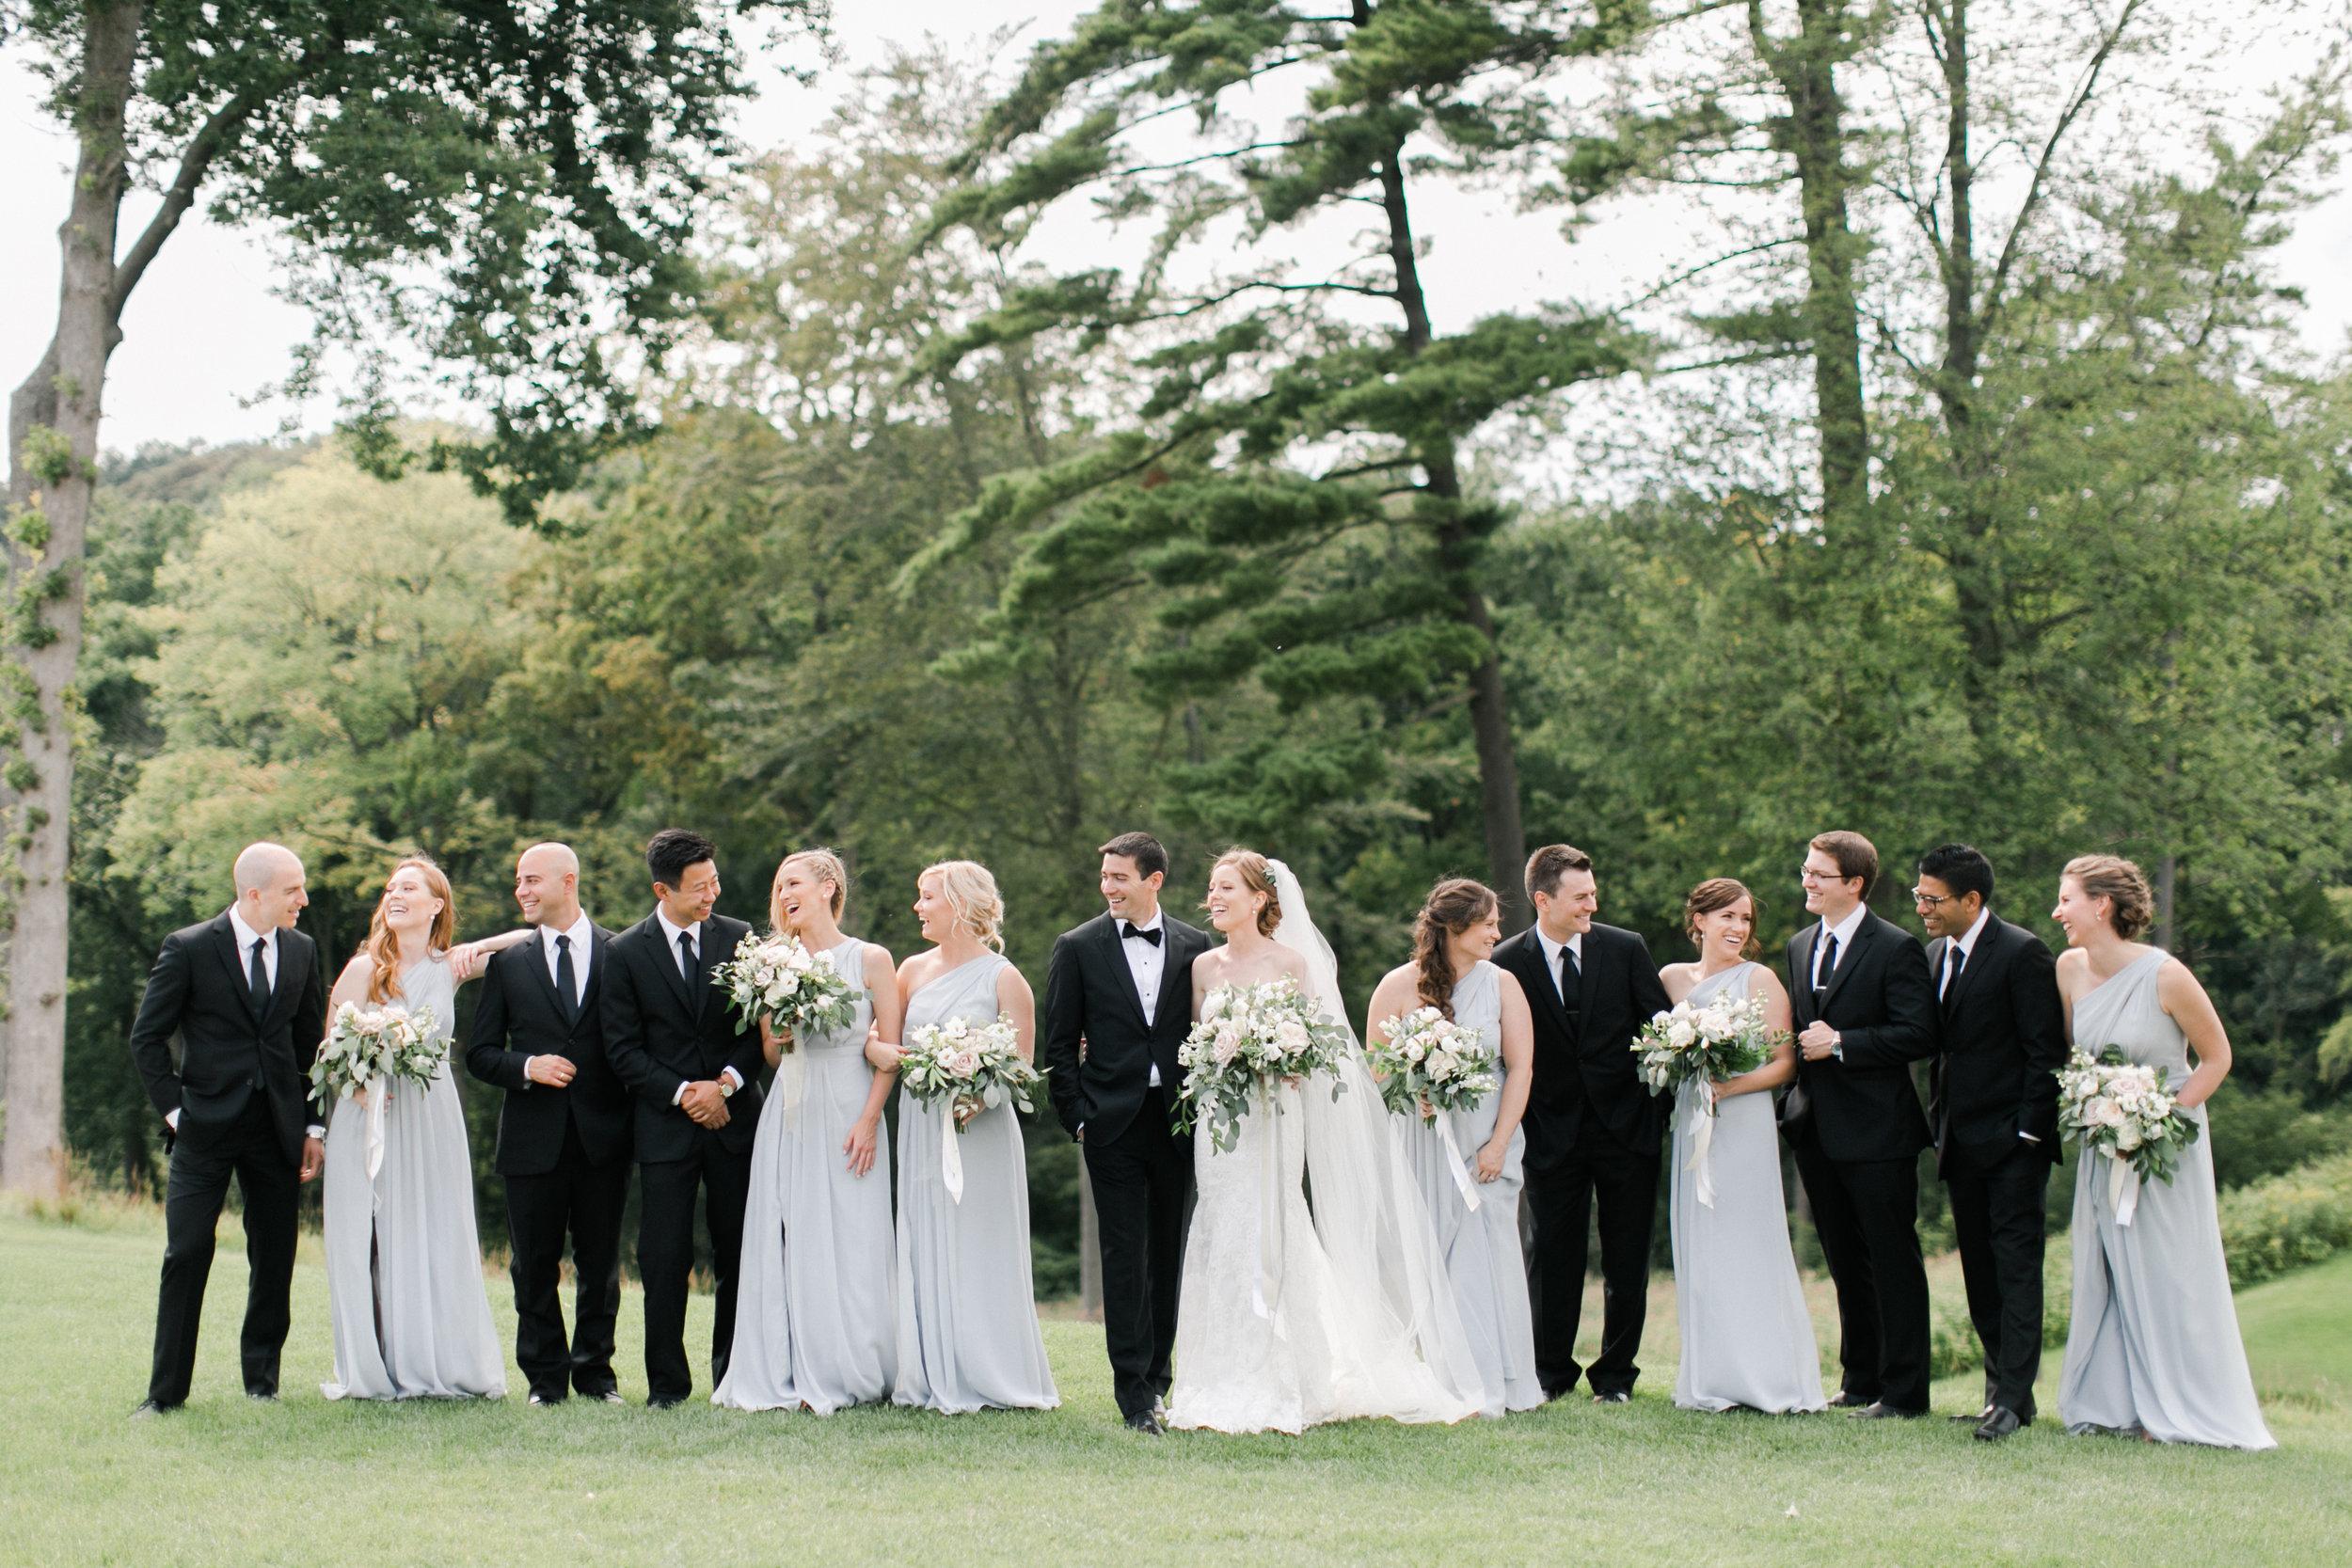 london-hunt-club-toronto-wedding-photographer-bright-richelle-hunter-jewish-ceremony-jessica-shemer-309.jpg